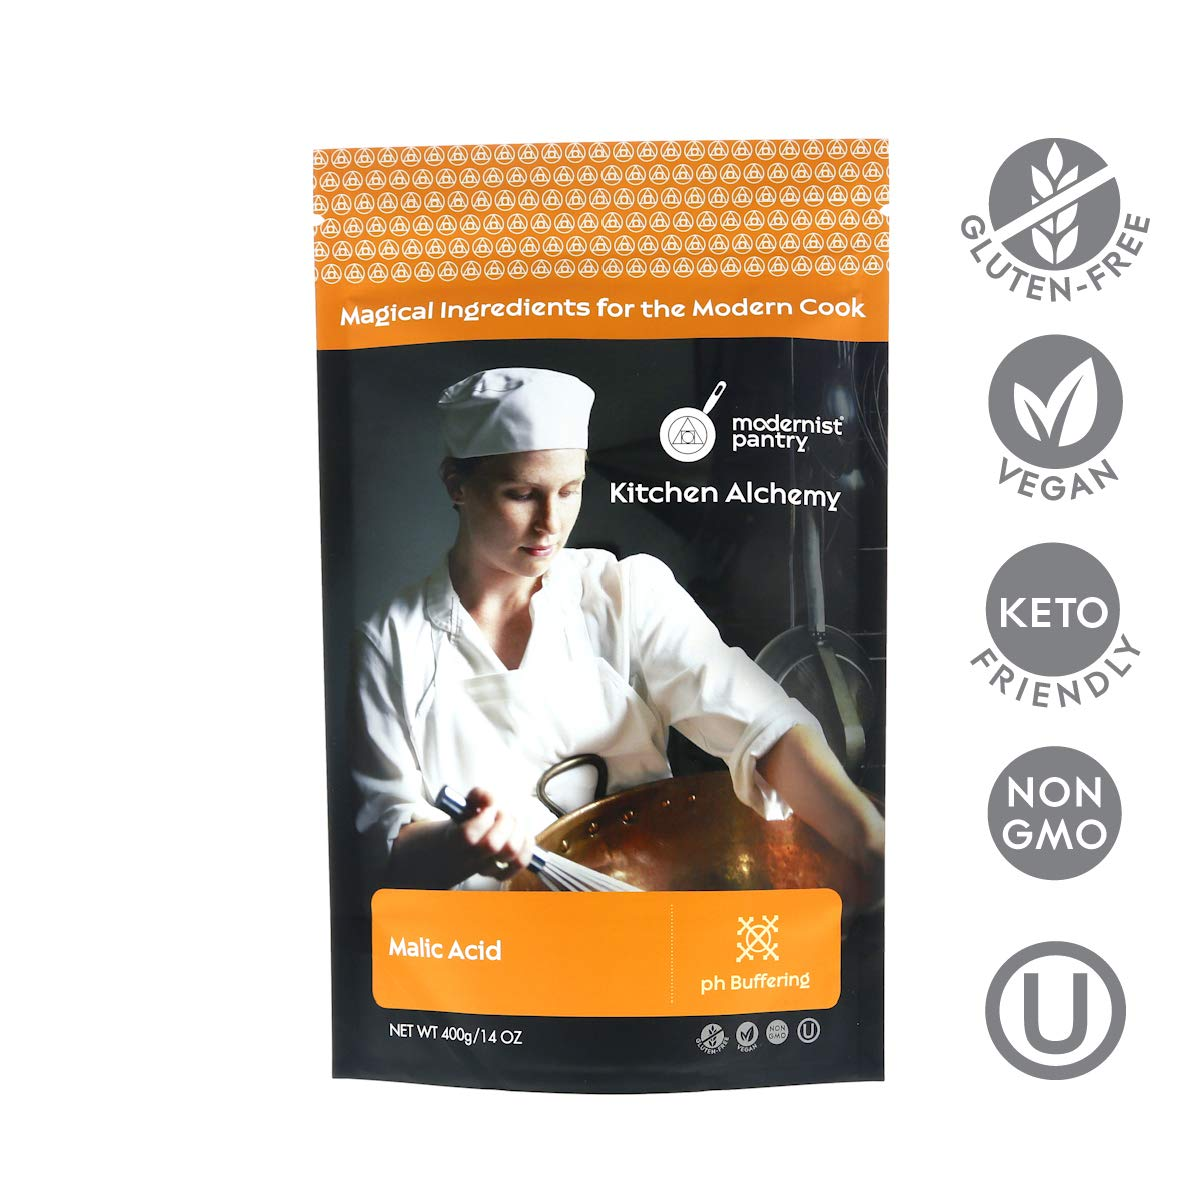 Pure Malic Acid ⊘ Non-GMO ❤ Gluten-Free ☮ Vegan ✡ OU Kosher Certified - 400g/14oz